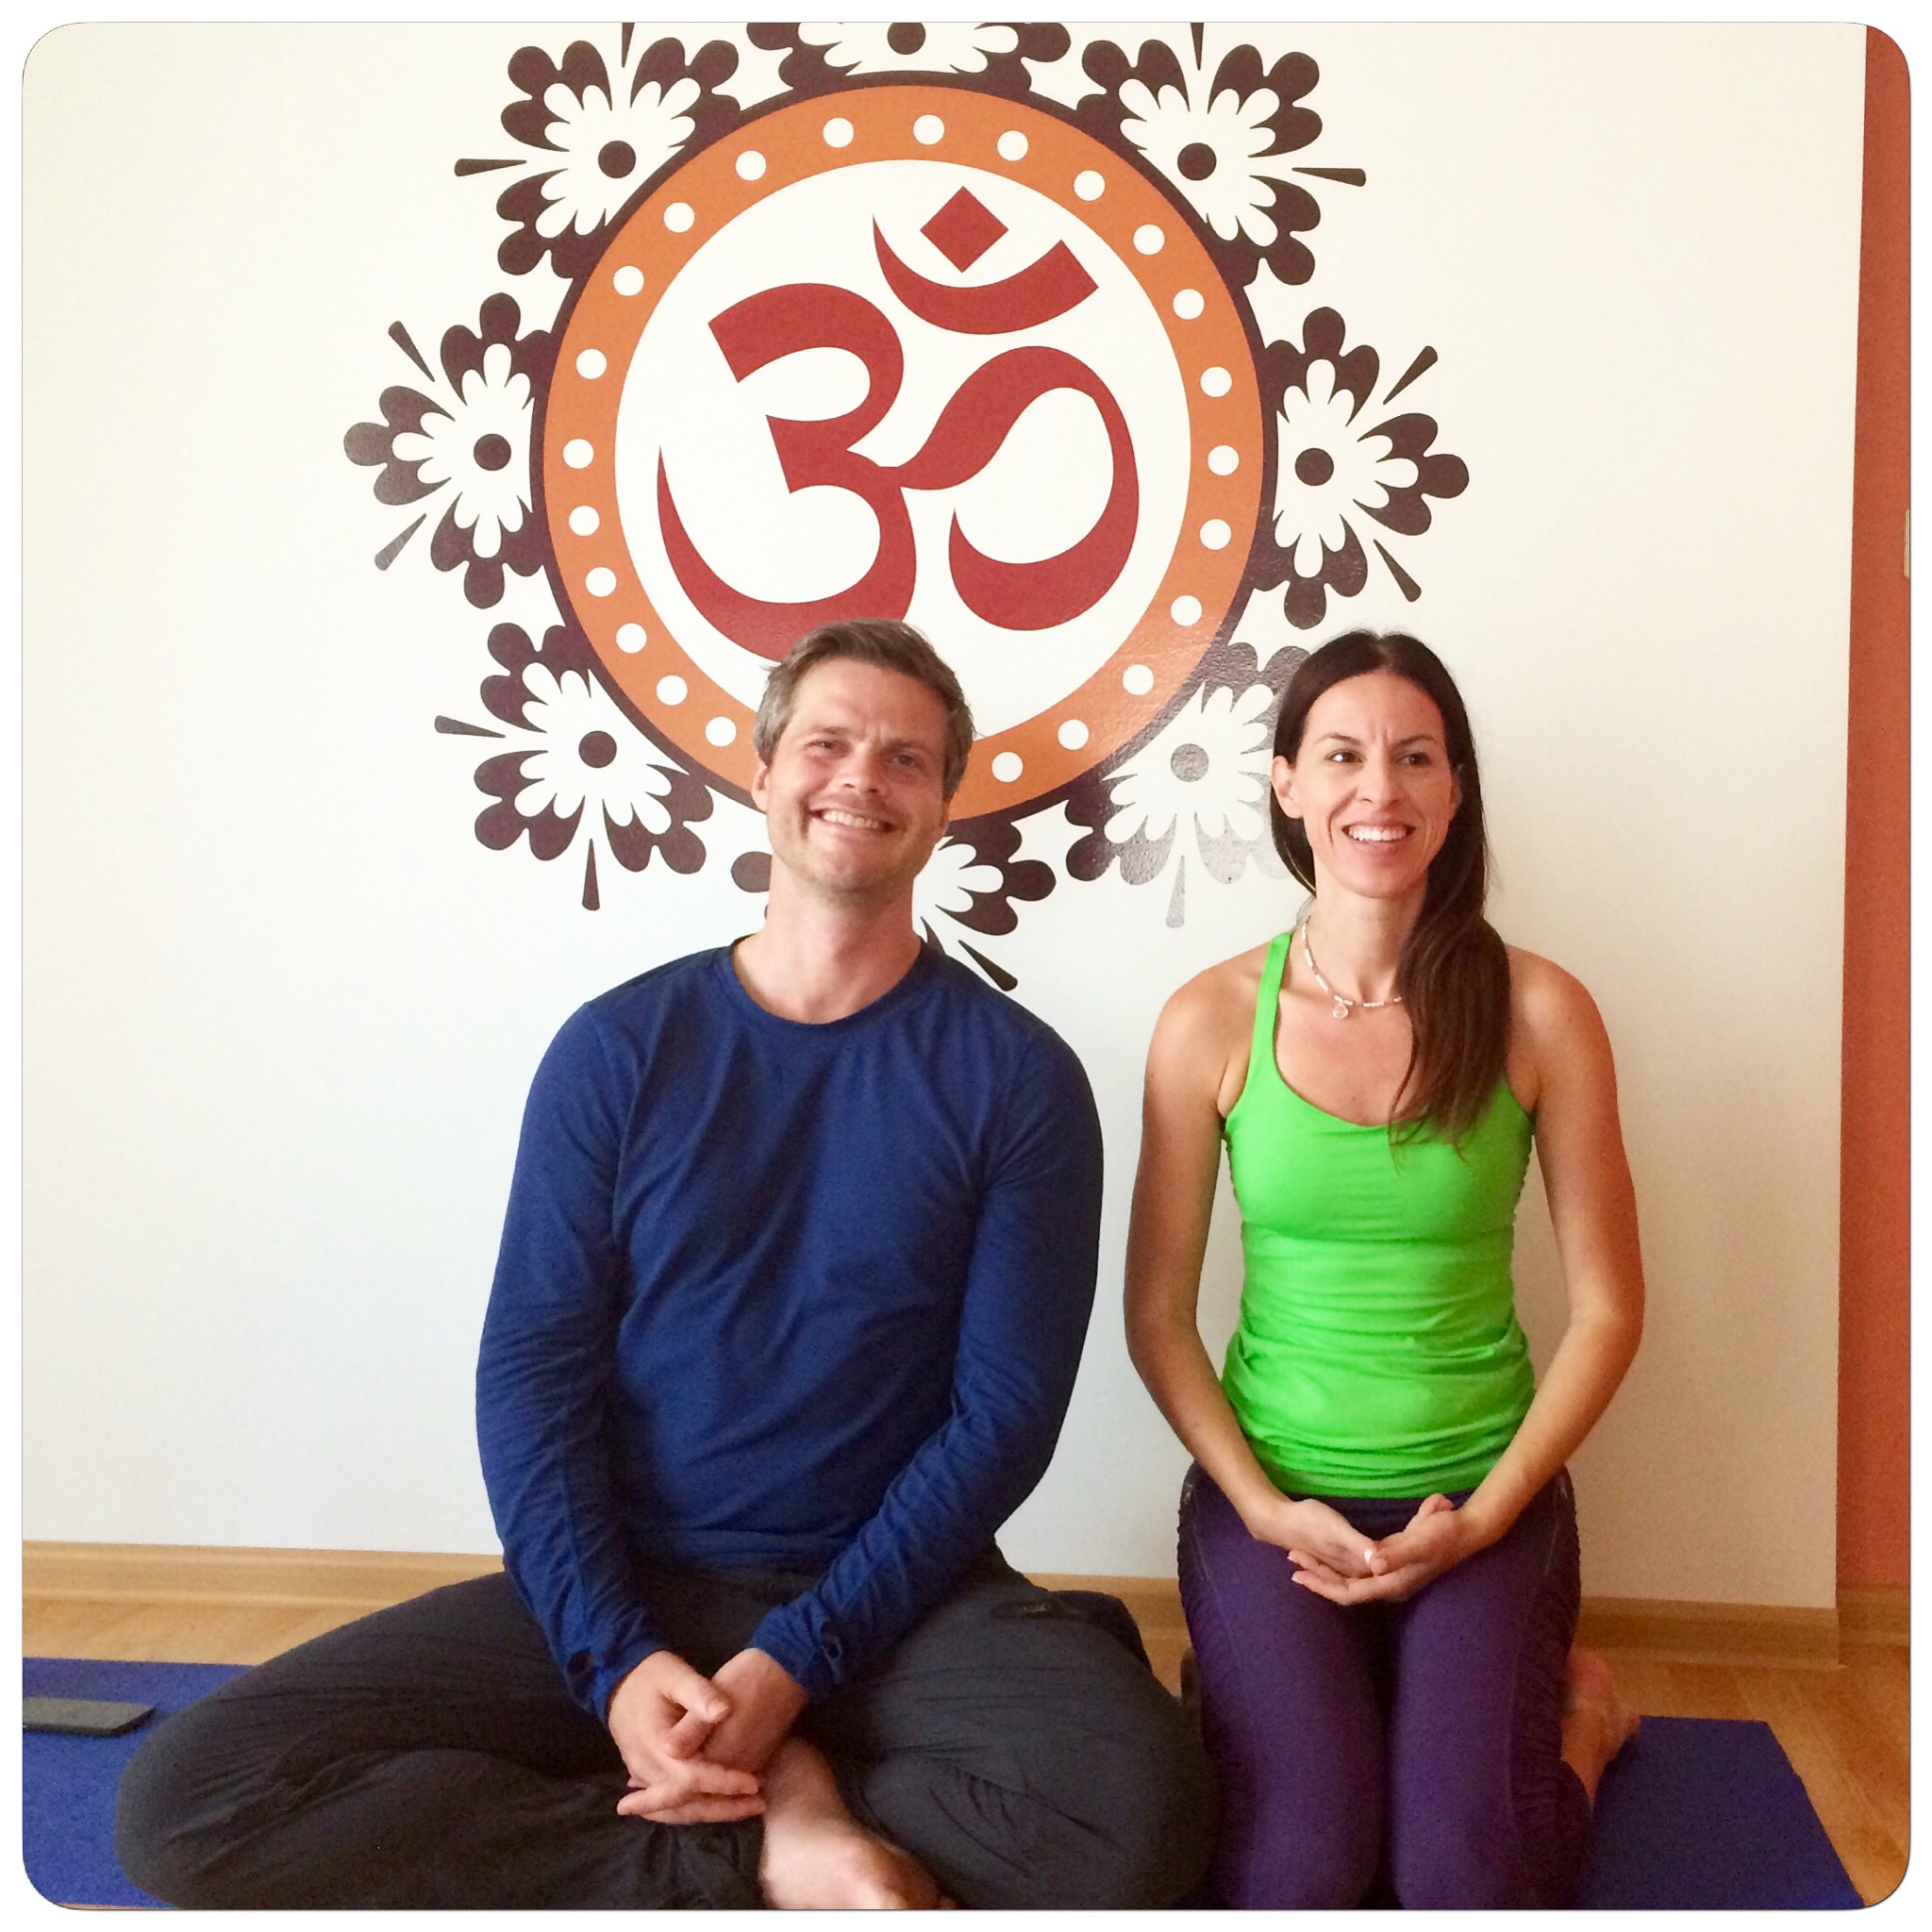 DAVID MAGONEJune 2015 - David Magone taught a 2 day Pranavayu Yoga Workshop in Aggeliki's Studio in Crete in June 2015.View More